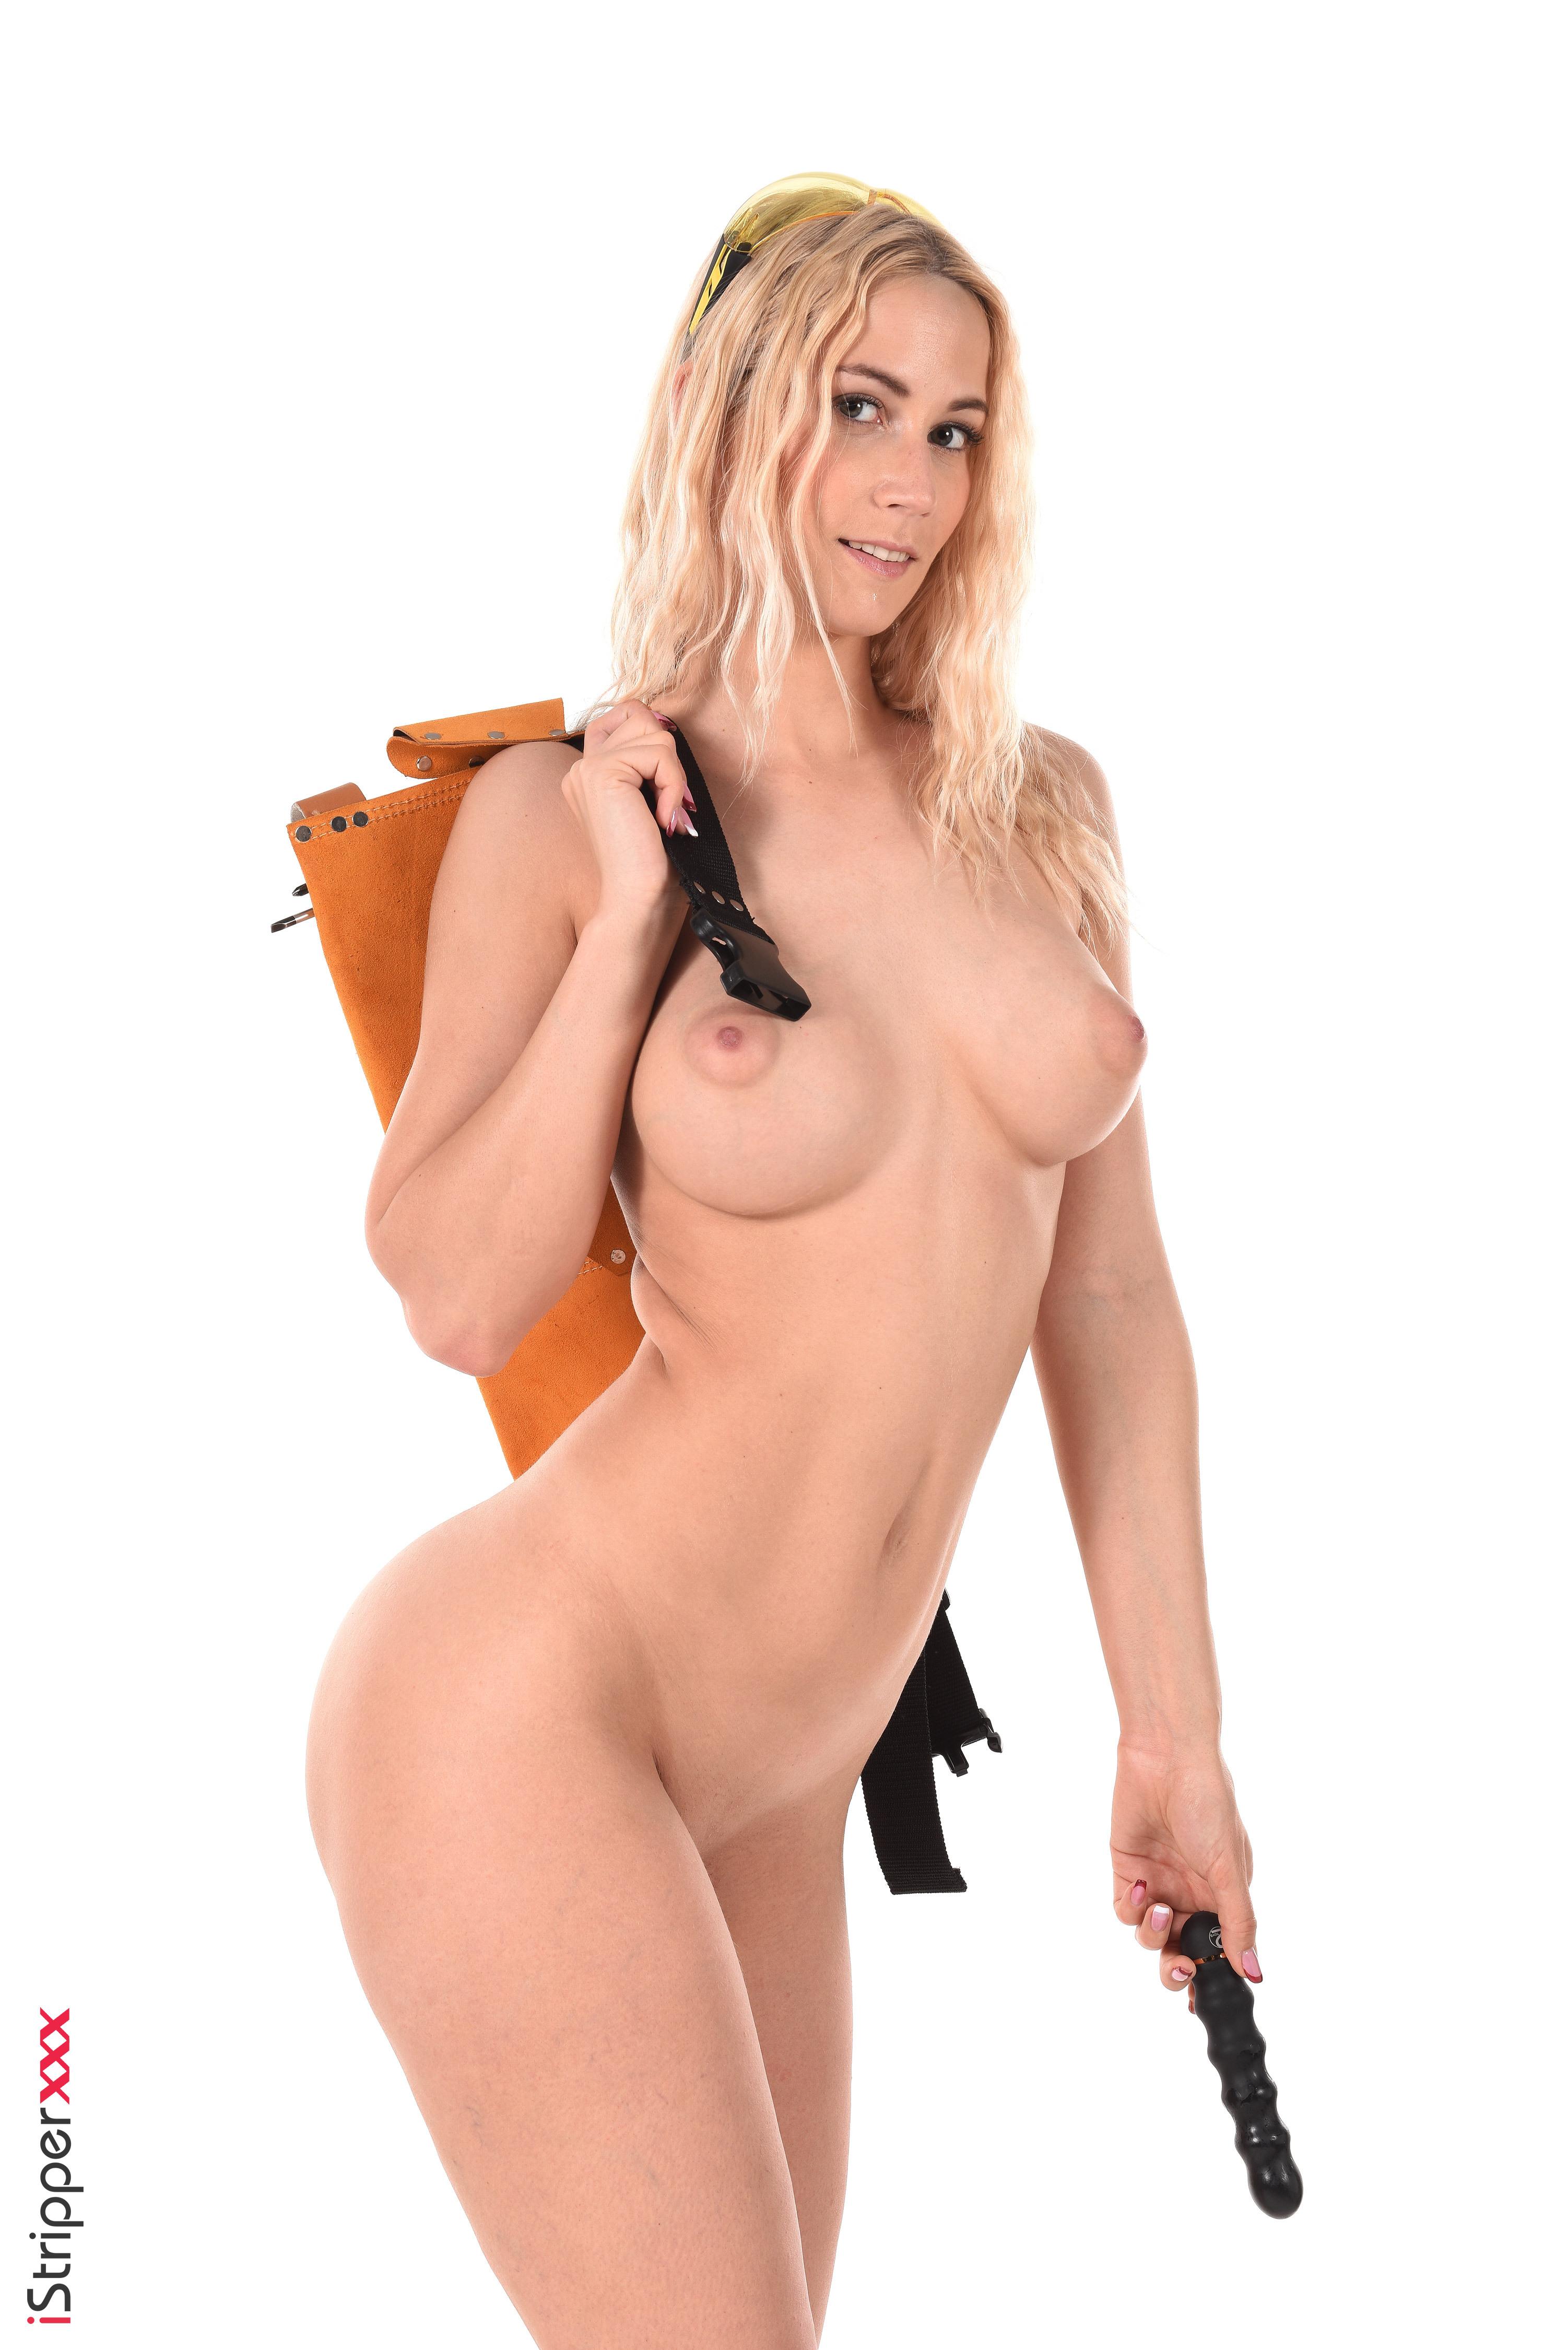 kelly brook nude wallpaper